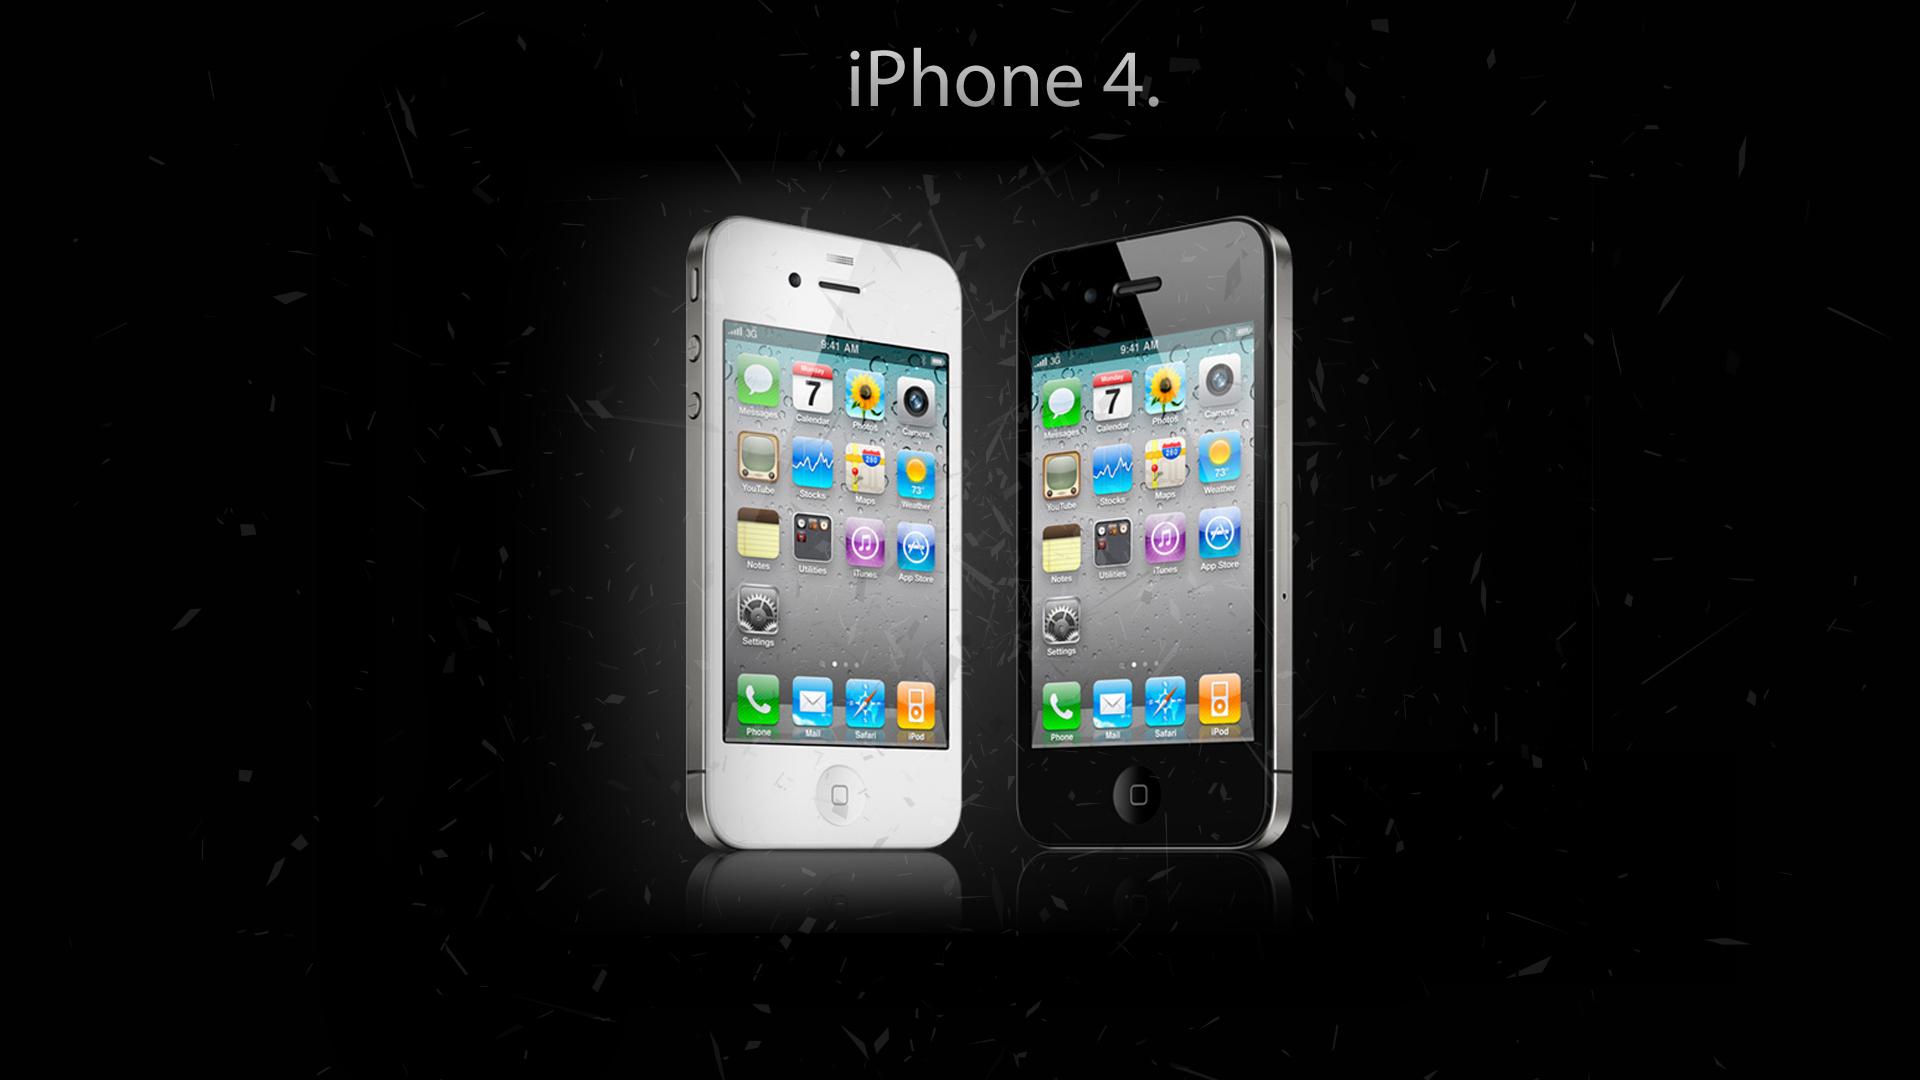 Обои Iphone 4, картинки - Обои для рабочего ...: www.fullhdoboi.ru/photo/brands/iphone_4/31-0-5554